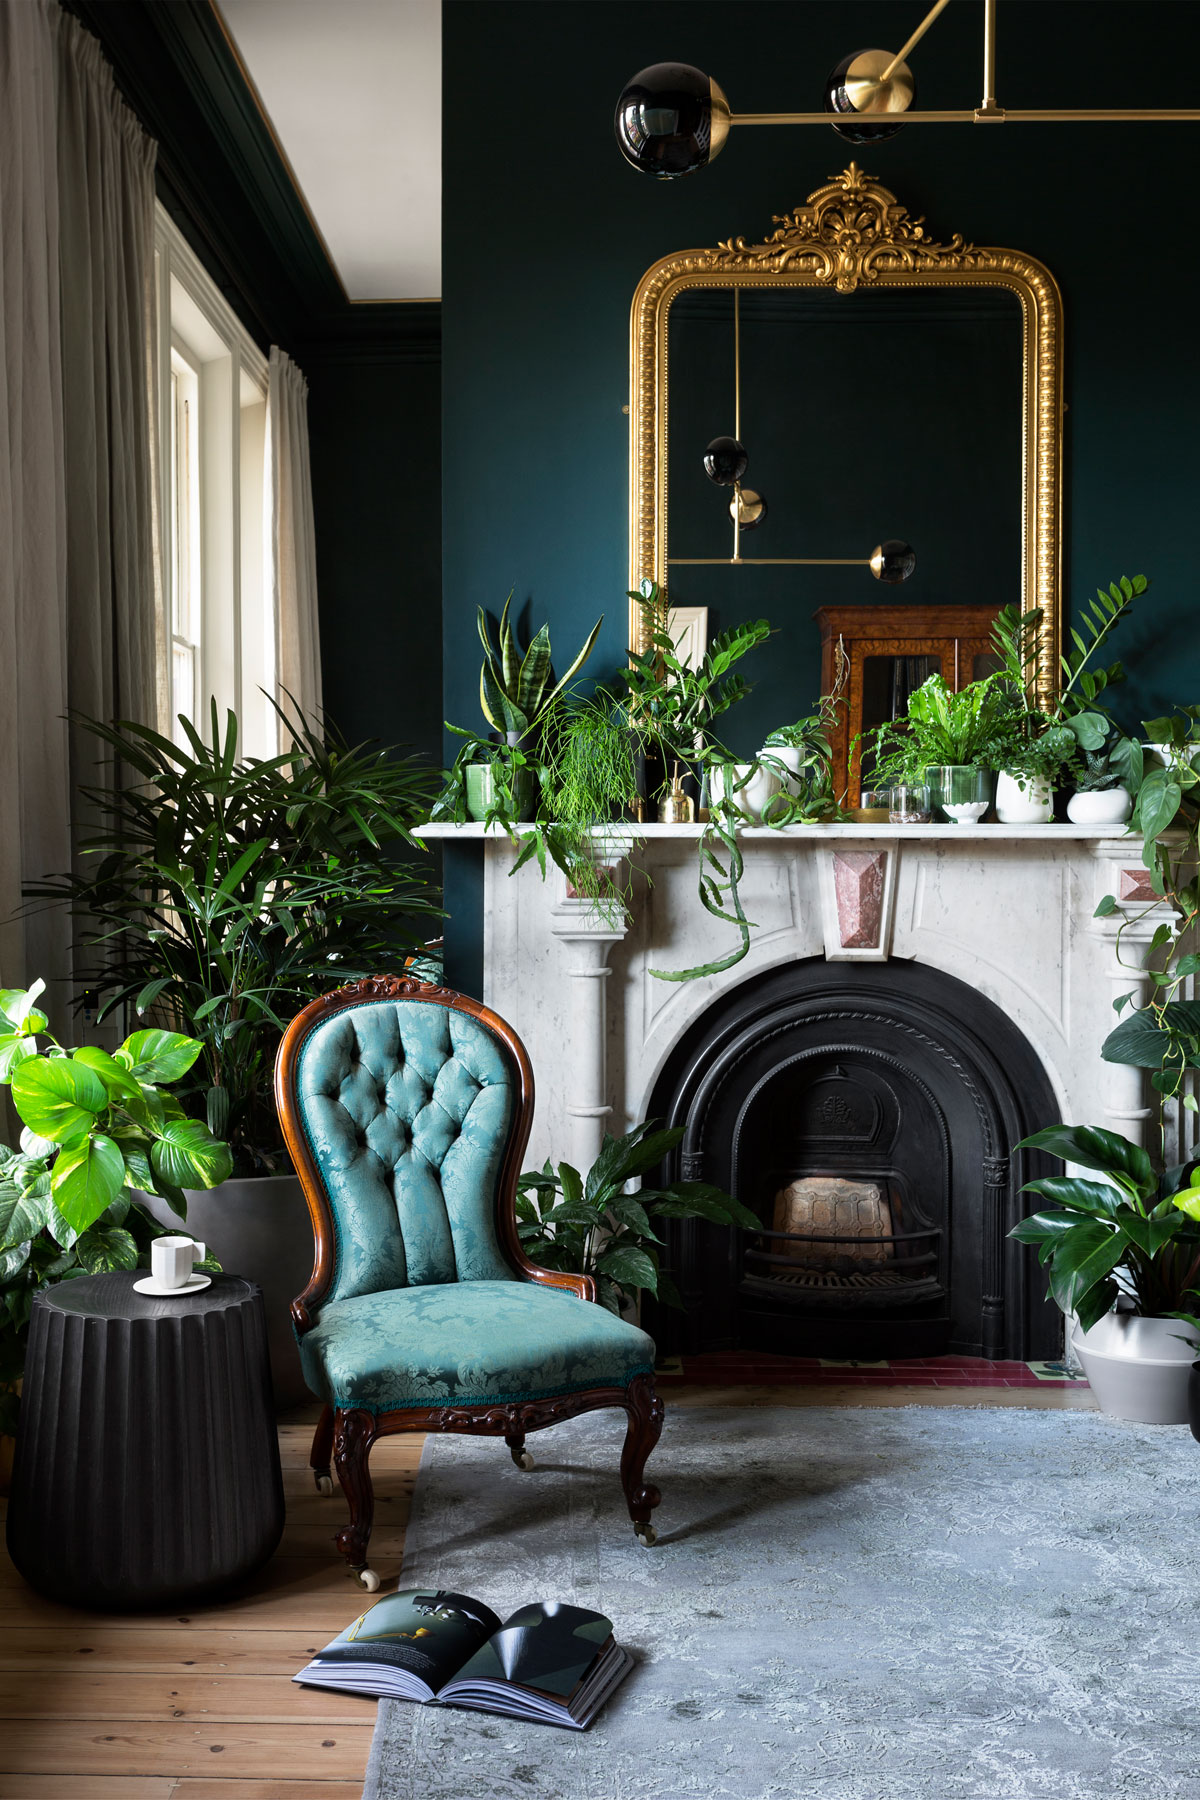 Bower-Architecture-Interior-Design-House-Green